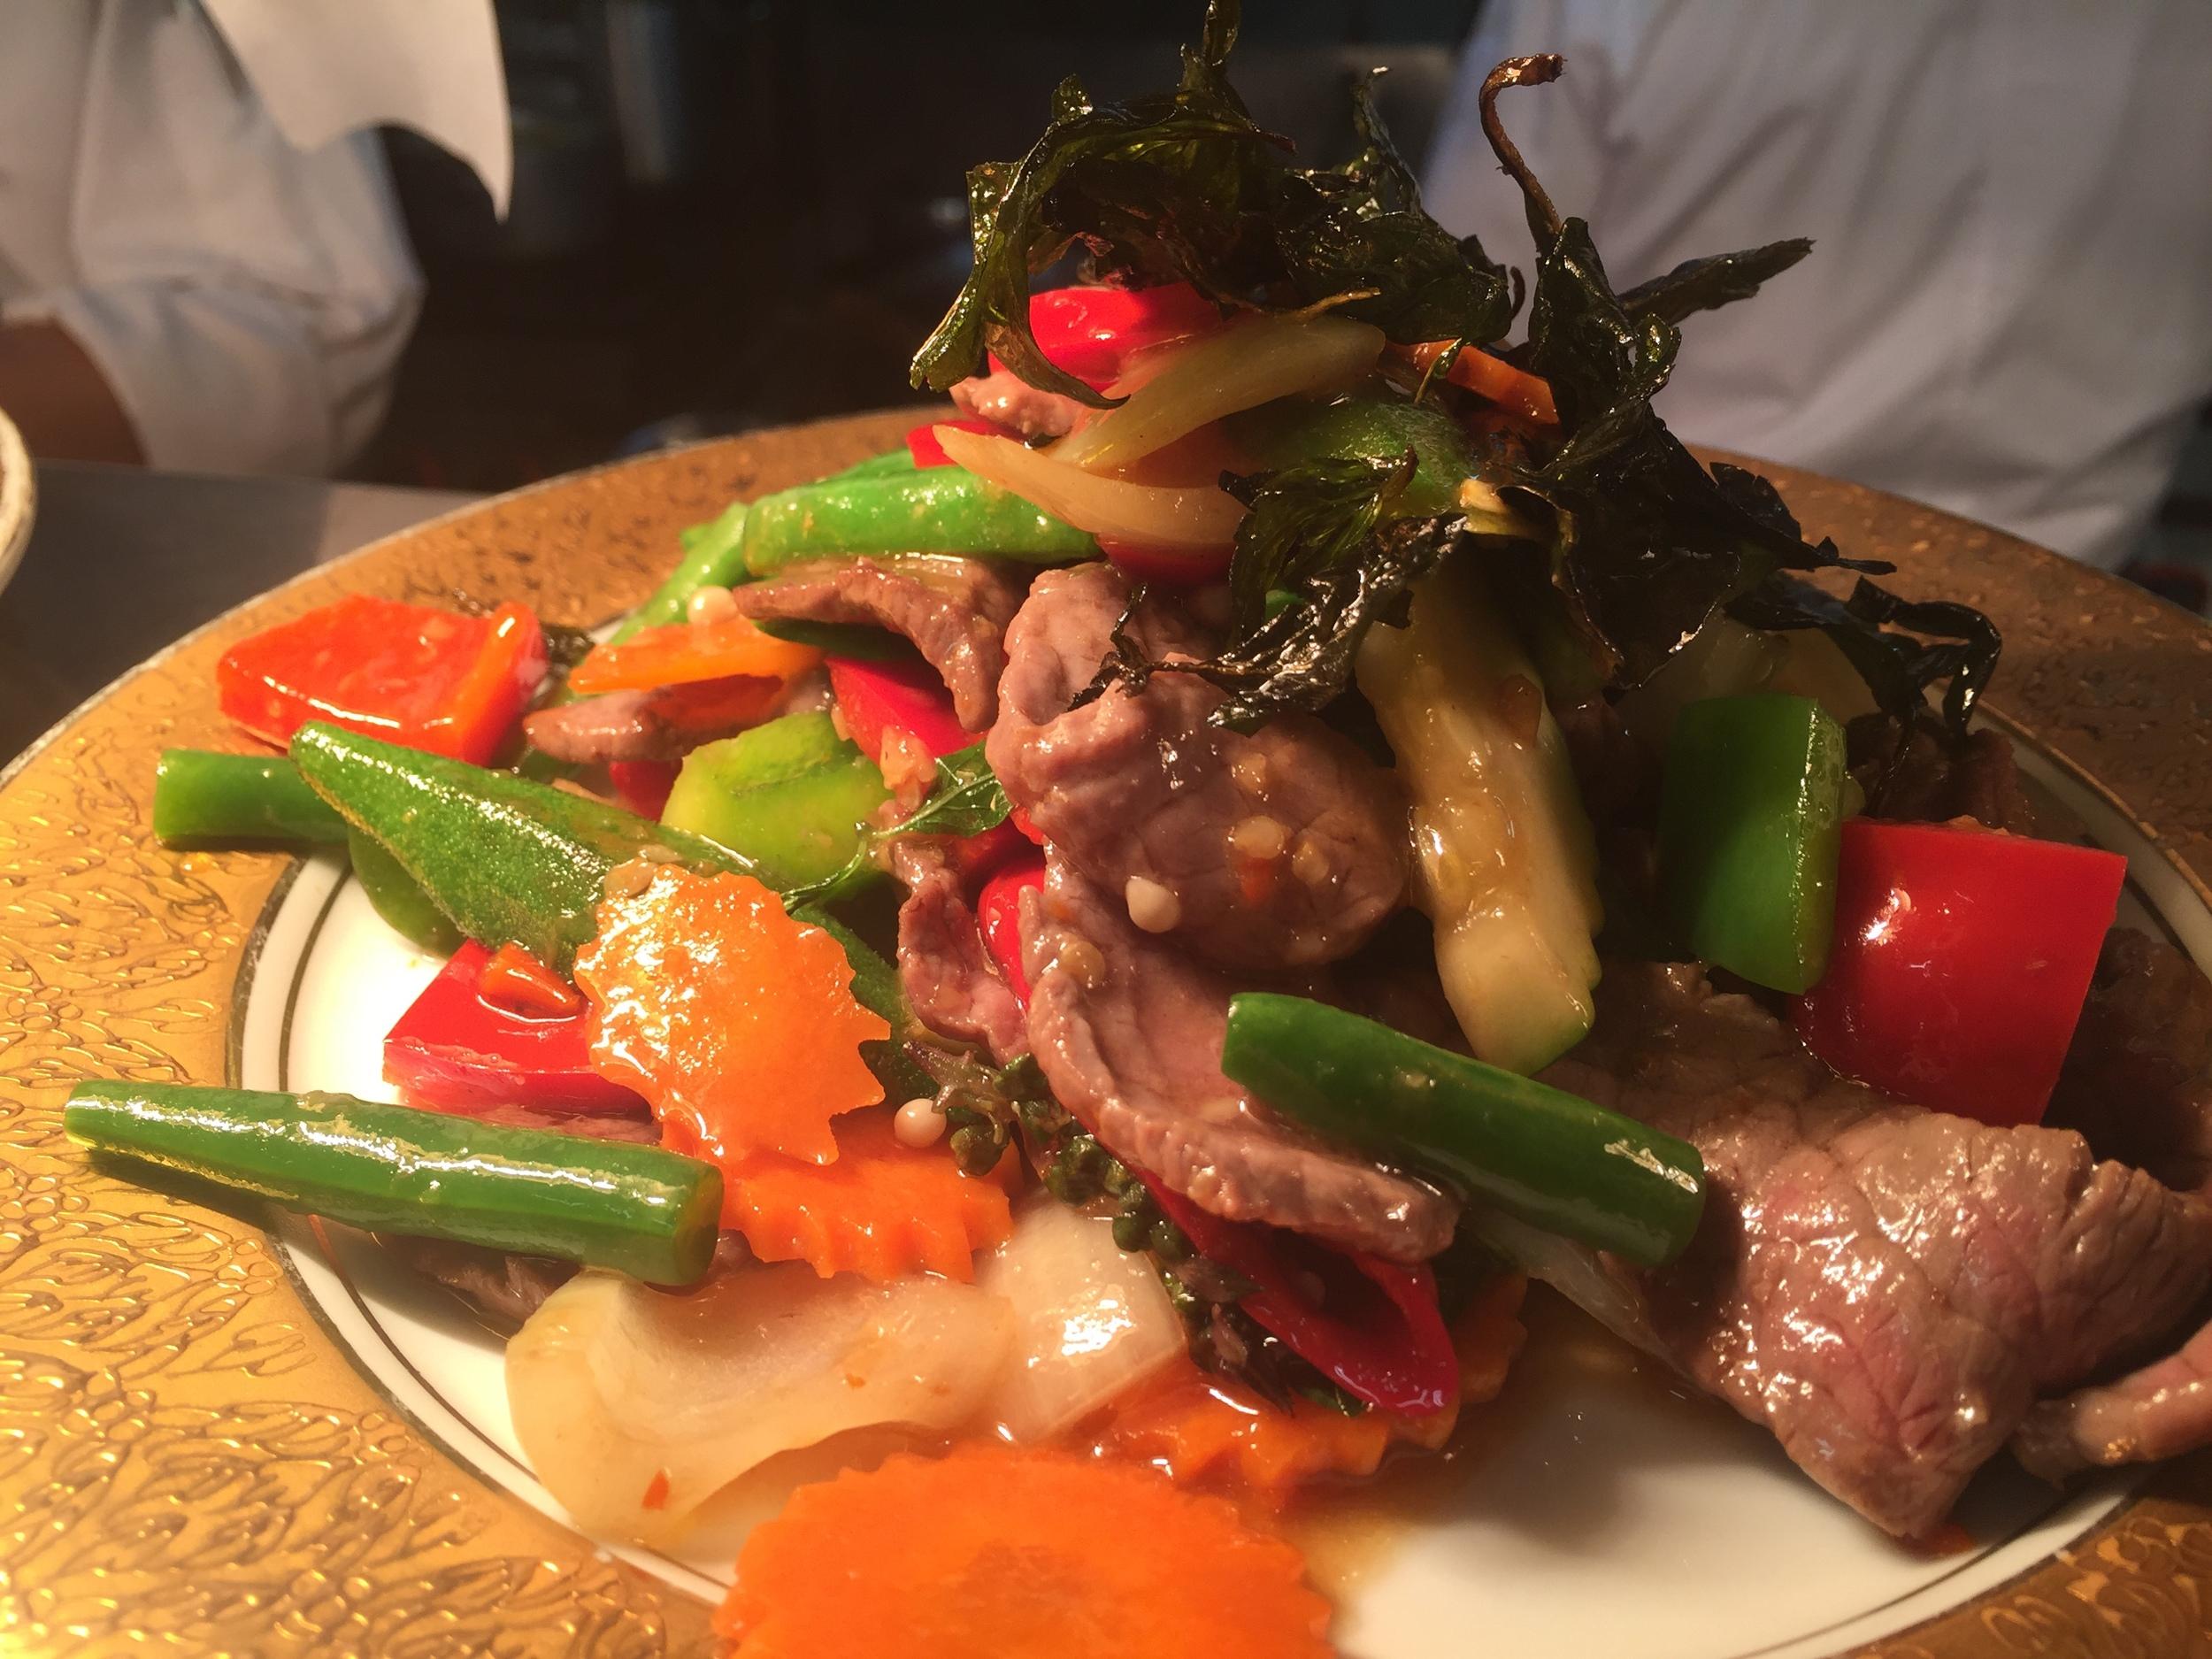 Thai-Cooking-Class-Melbourne-Paladarr-1300 725 232.jpg